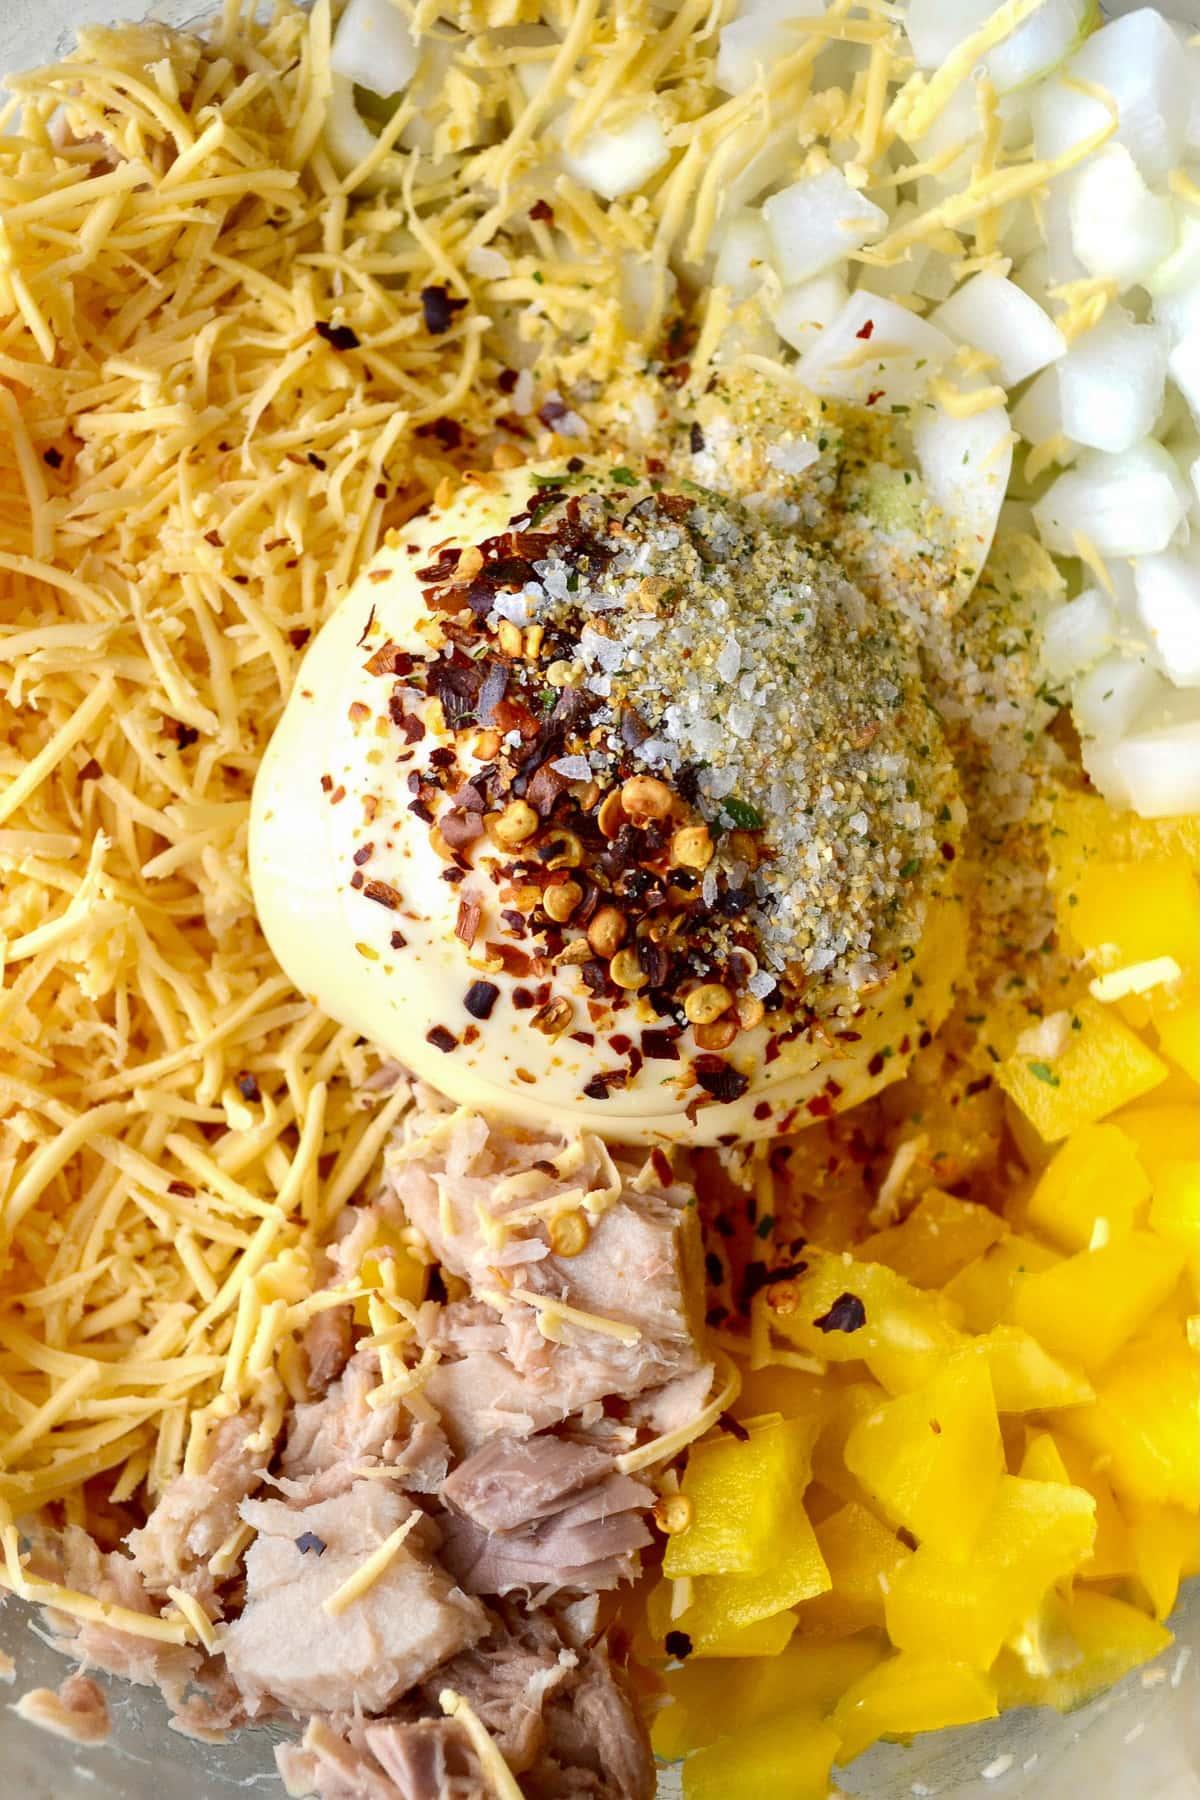 Keto Tuna Casserole ingredients